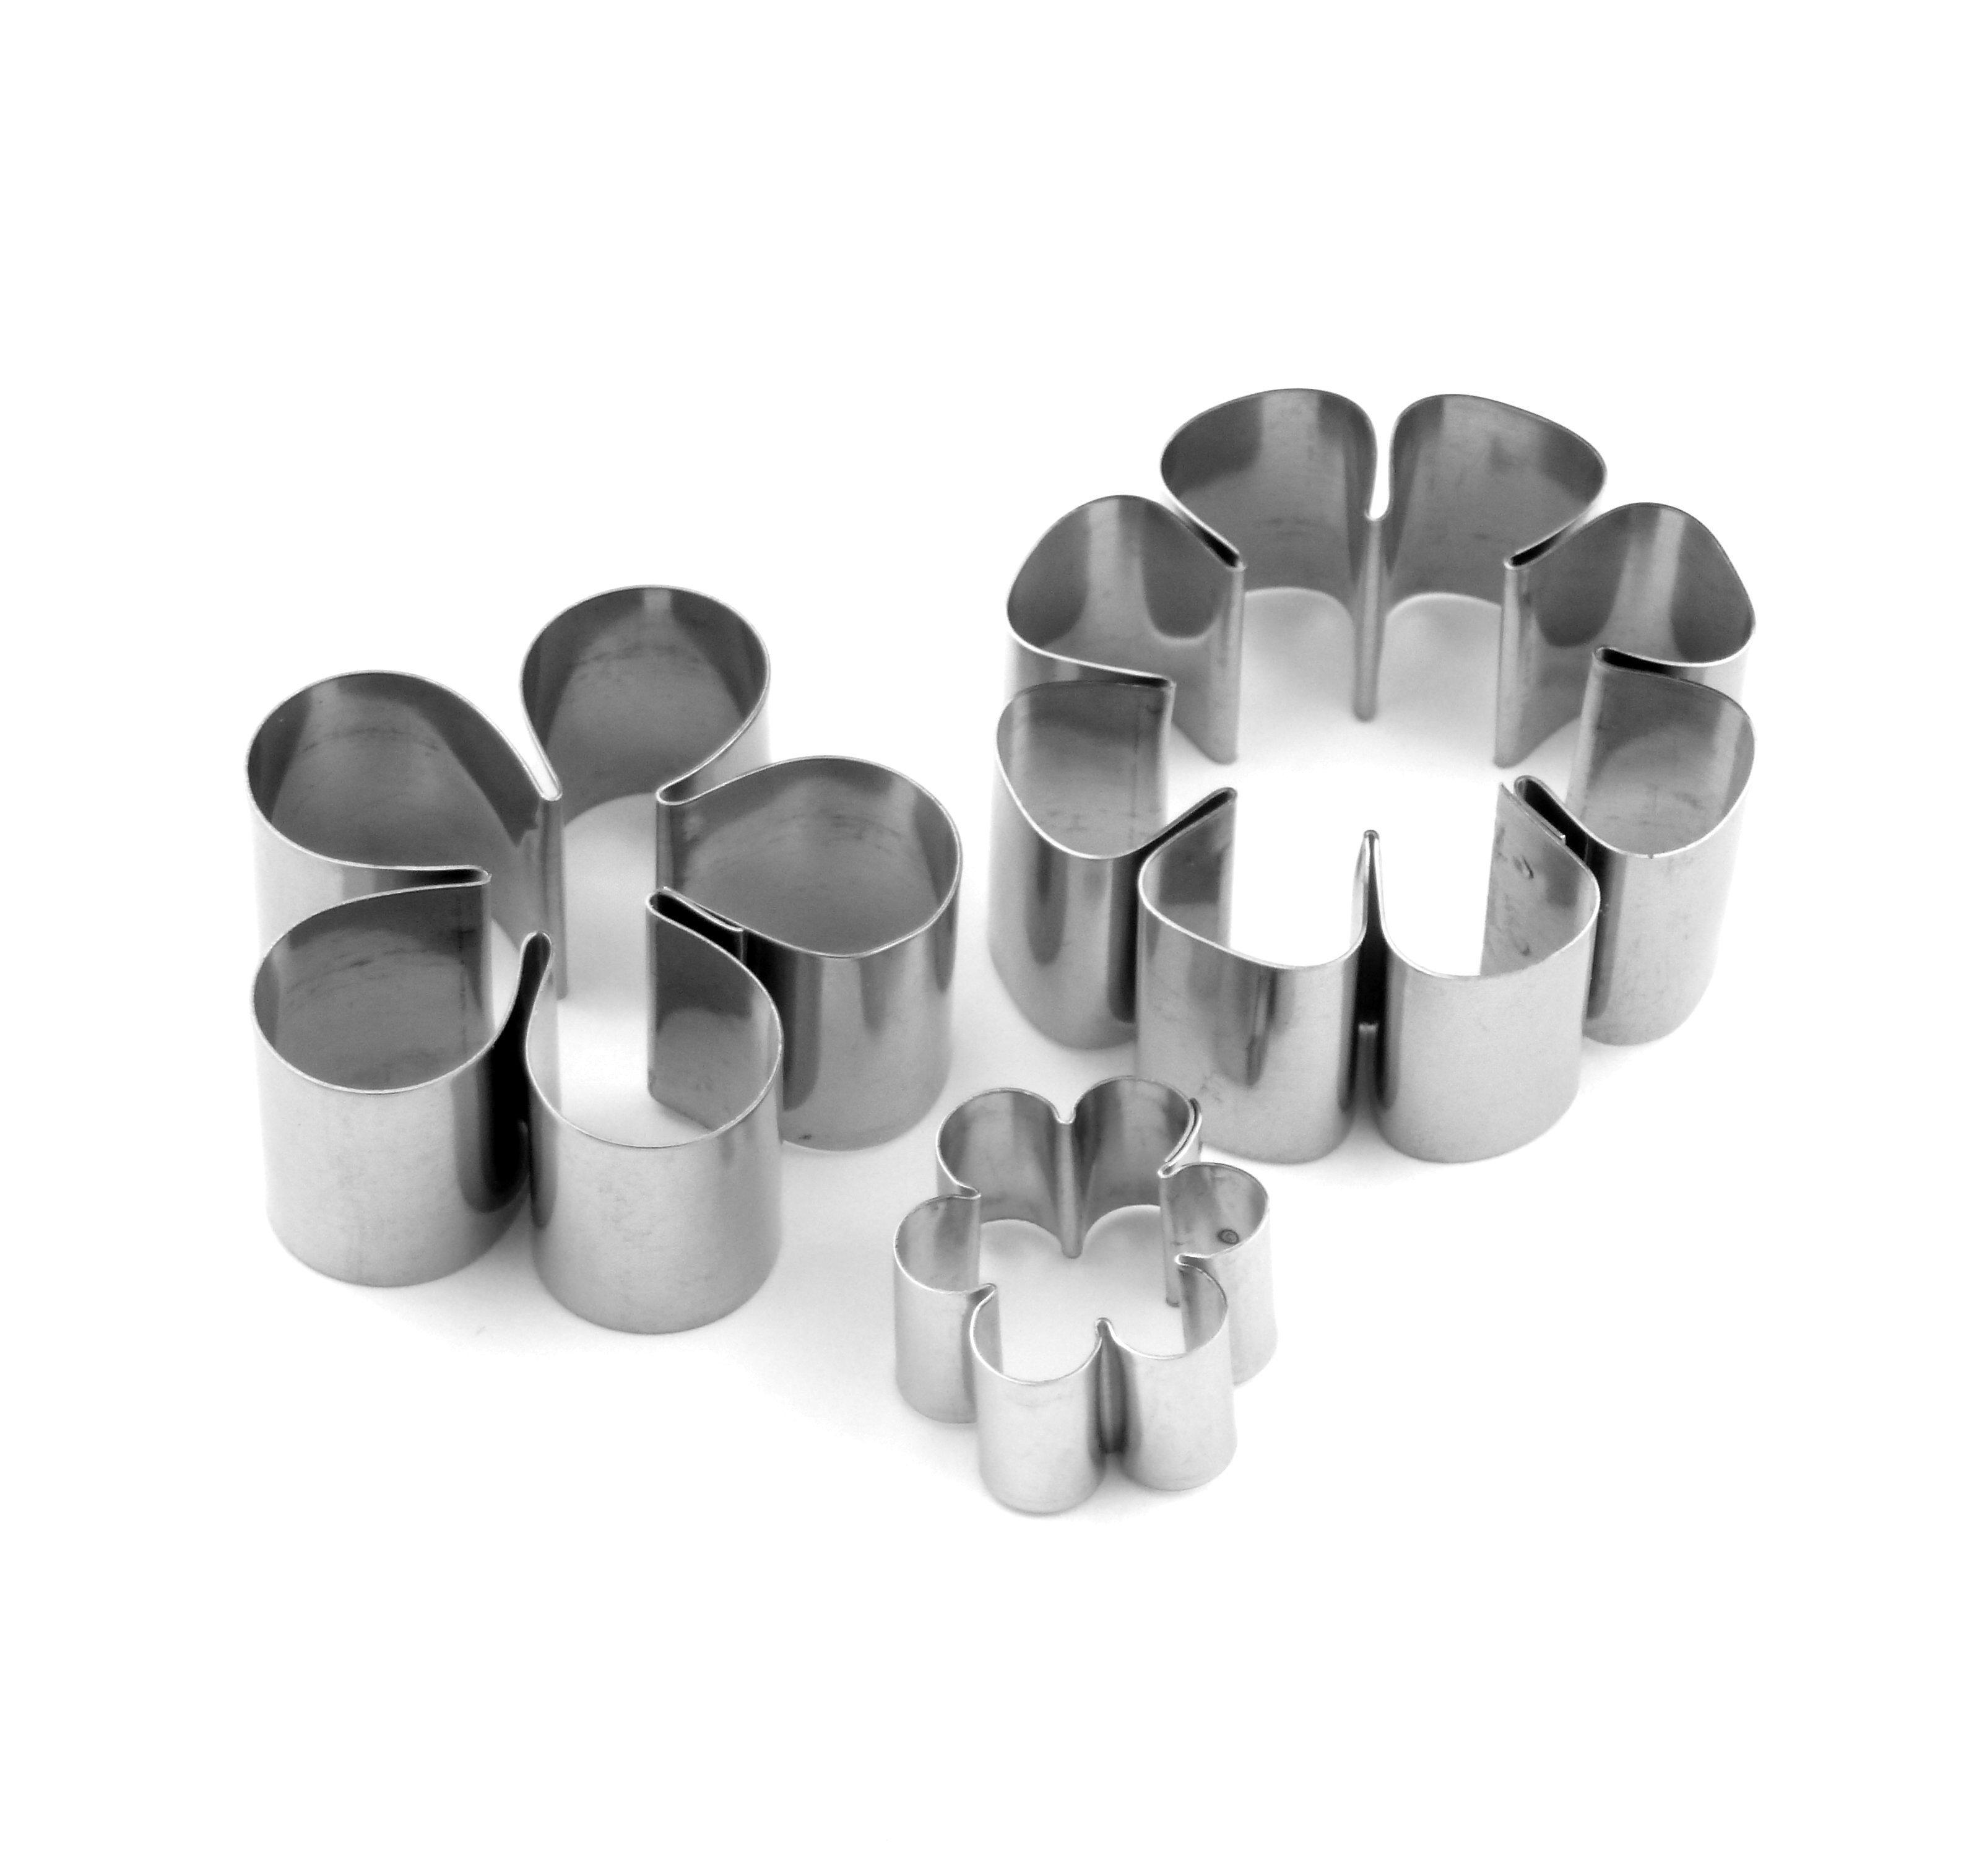 Flat Floral Sugarcraft Cutter Collection - Set 1 (Lindy's) SKU17867